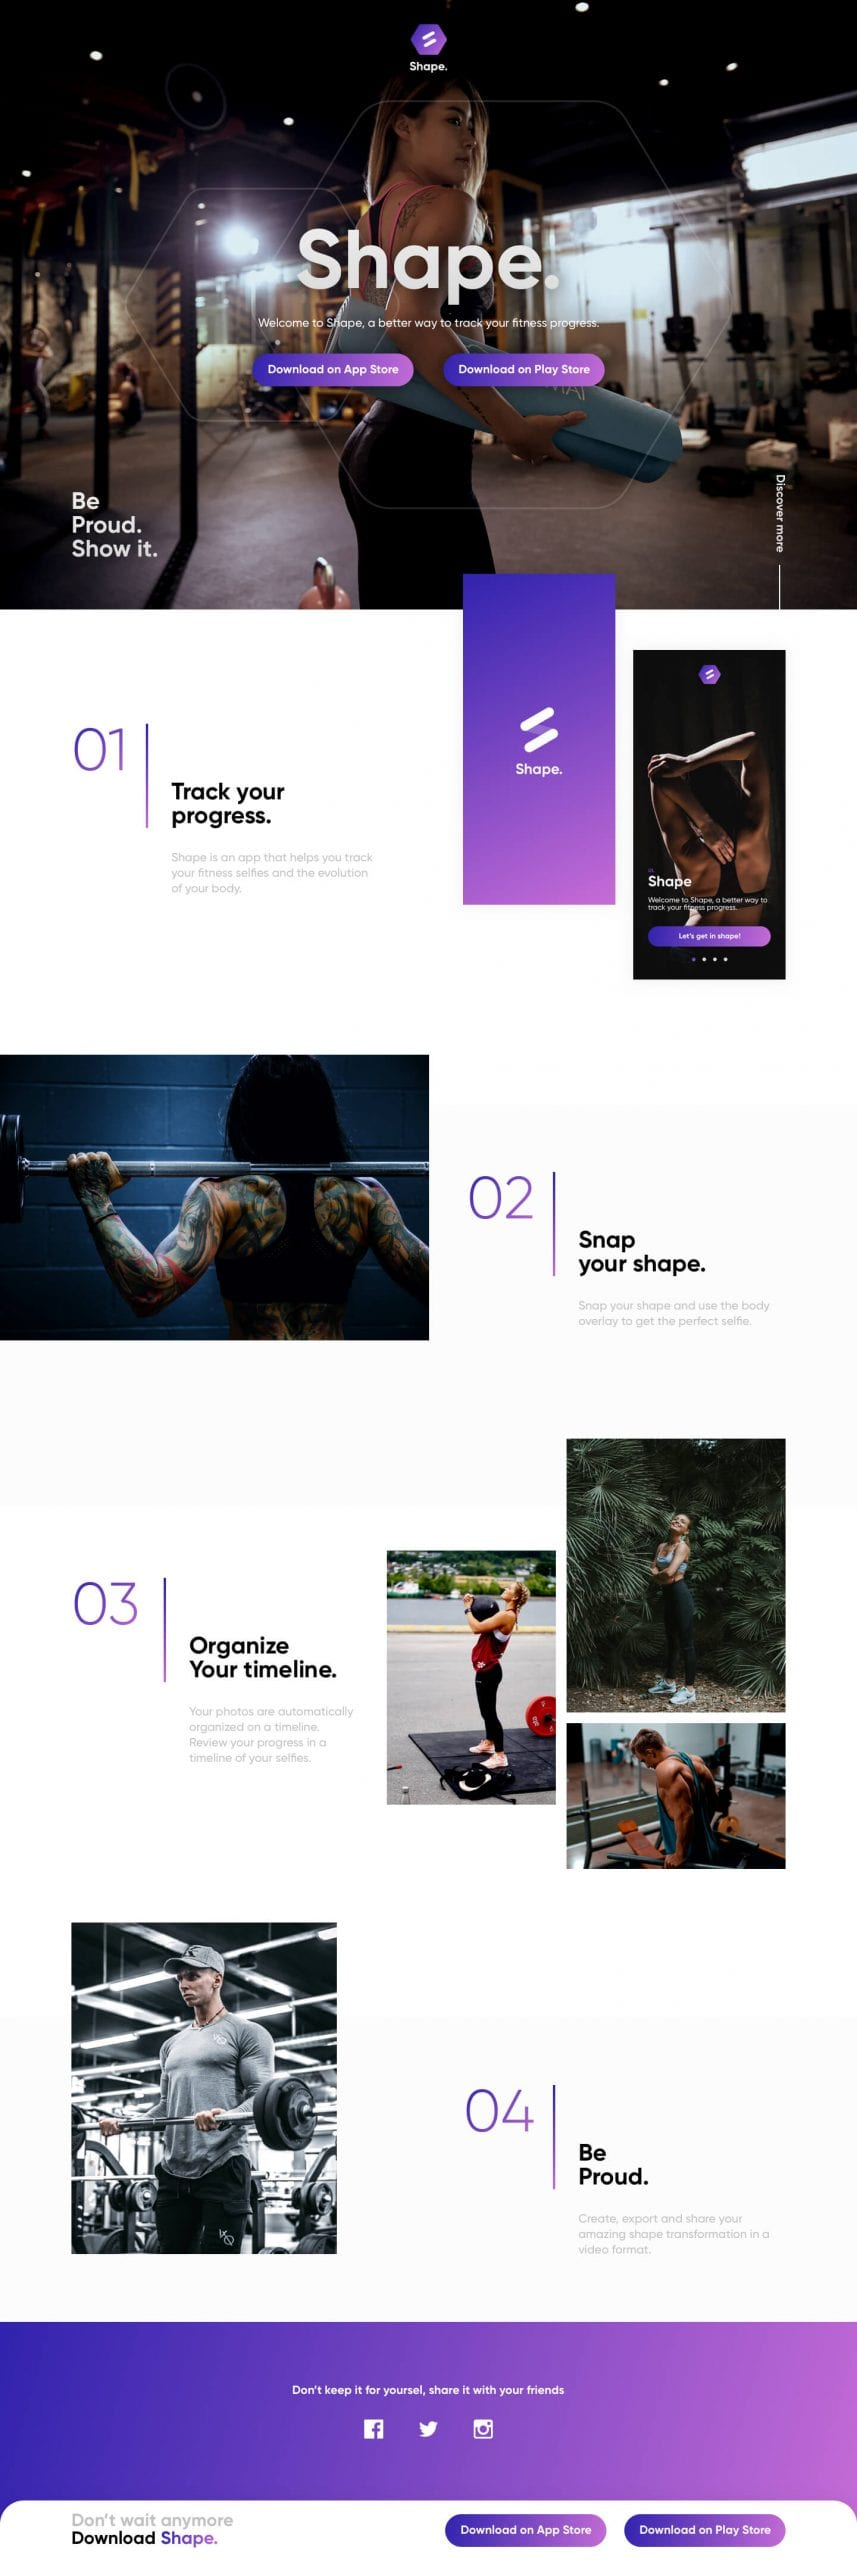 Shape APP Landing Page